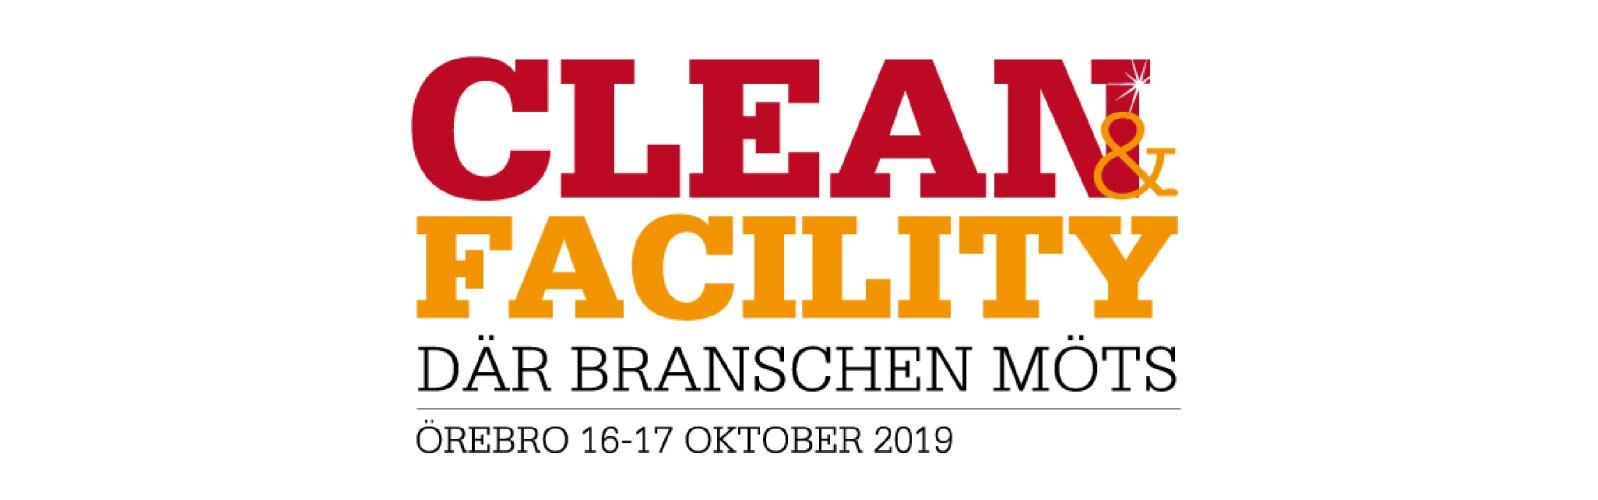 Clean-&-Facility-logo_Örebro-2019_original.jpg